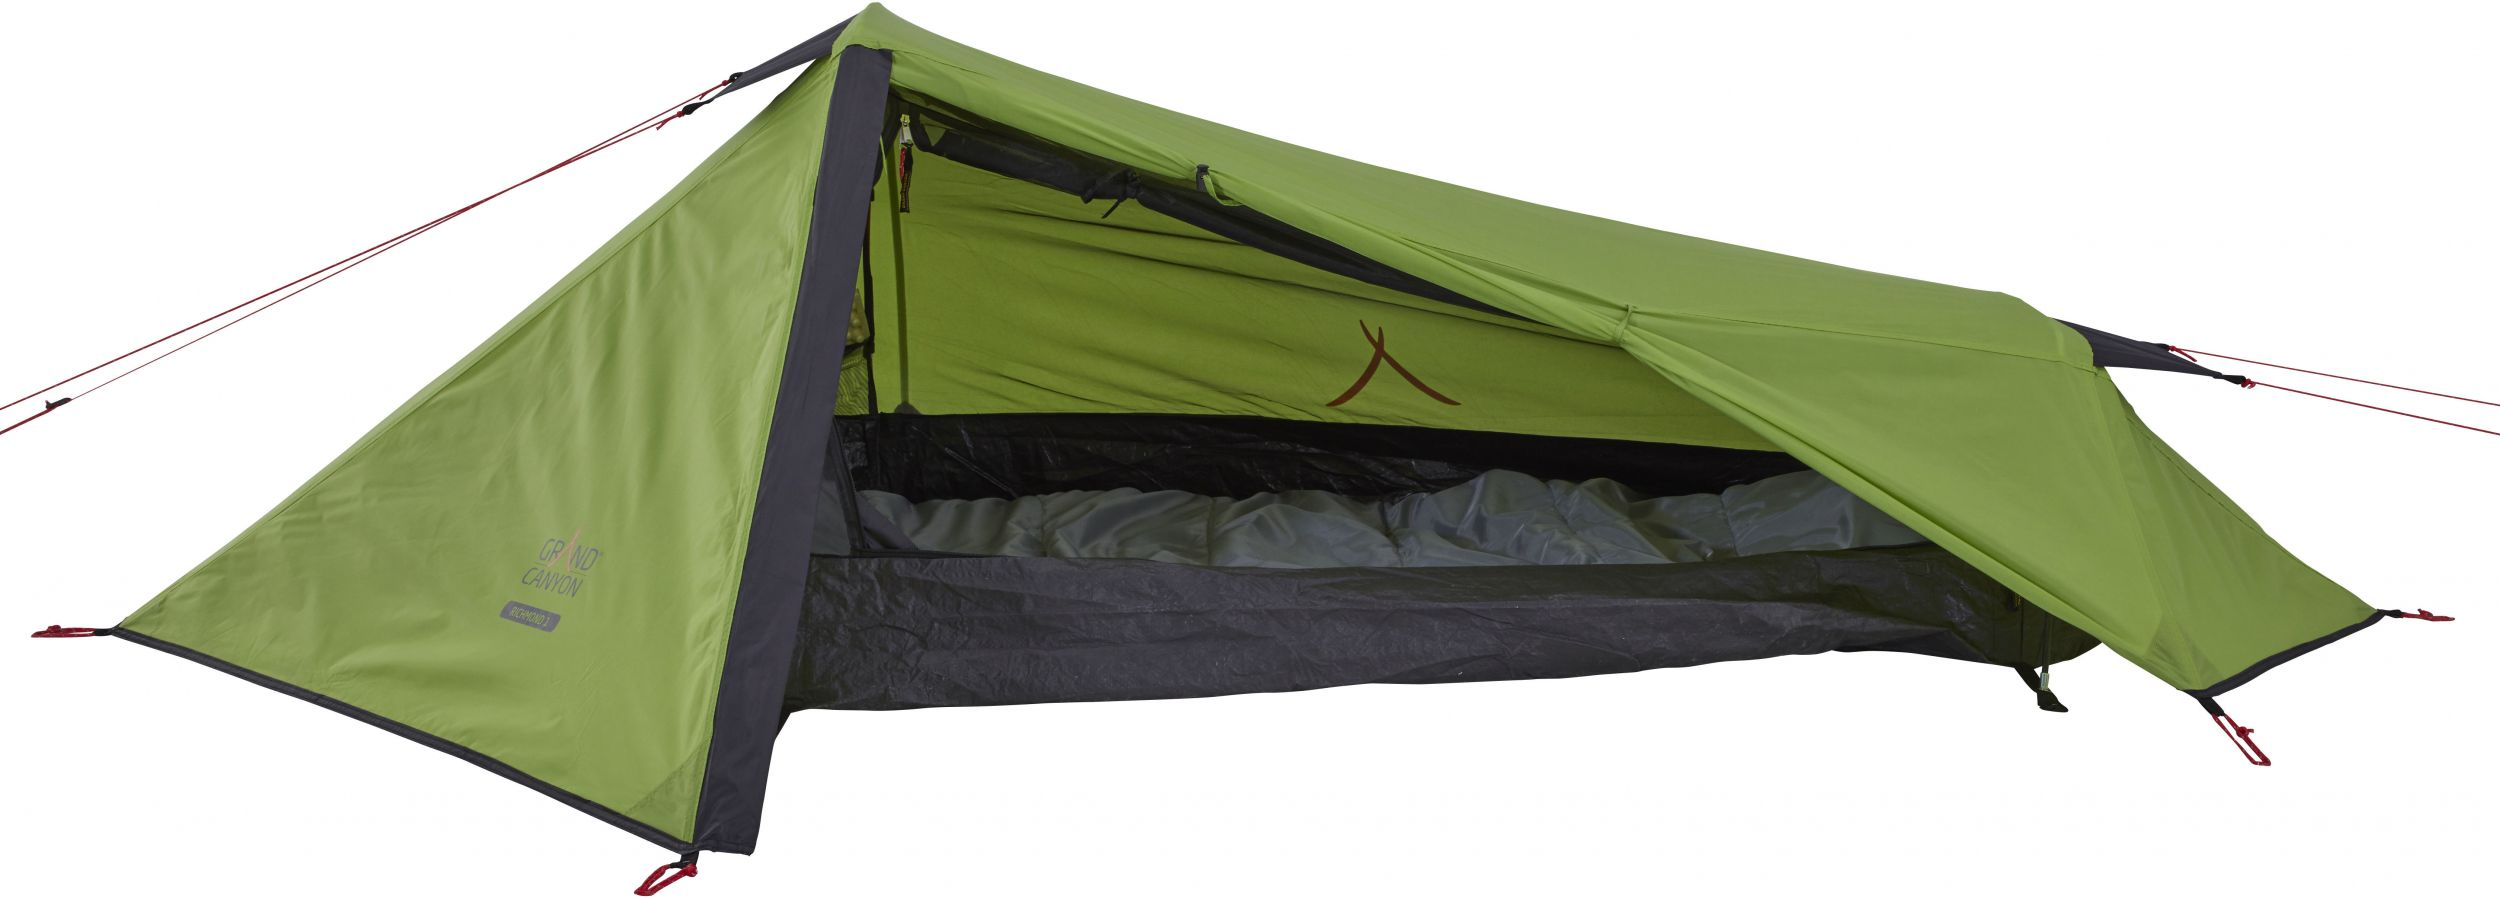 Grand_Canyon_Richmond_1_Tent_green[1920x1920]